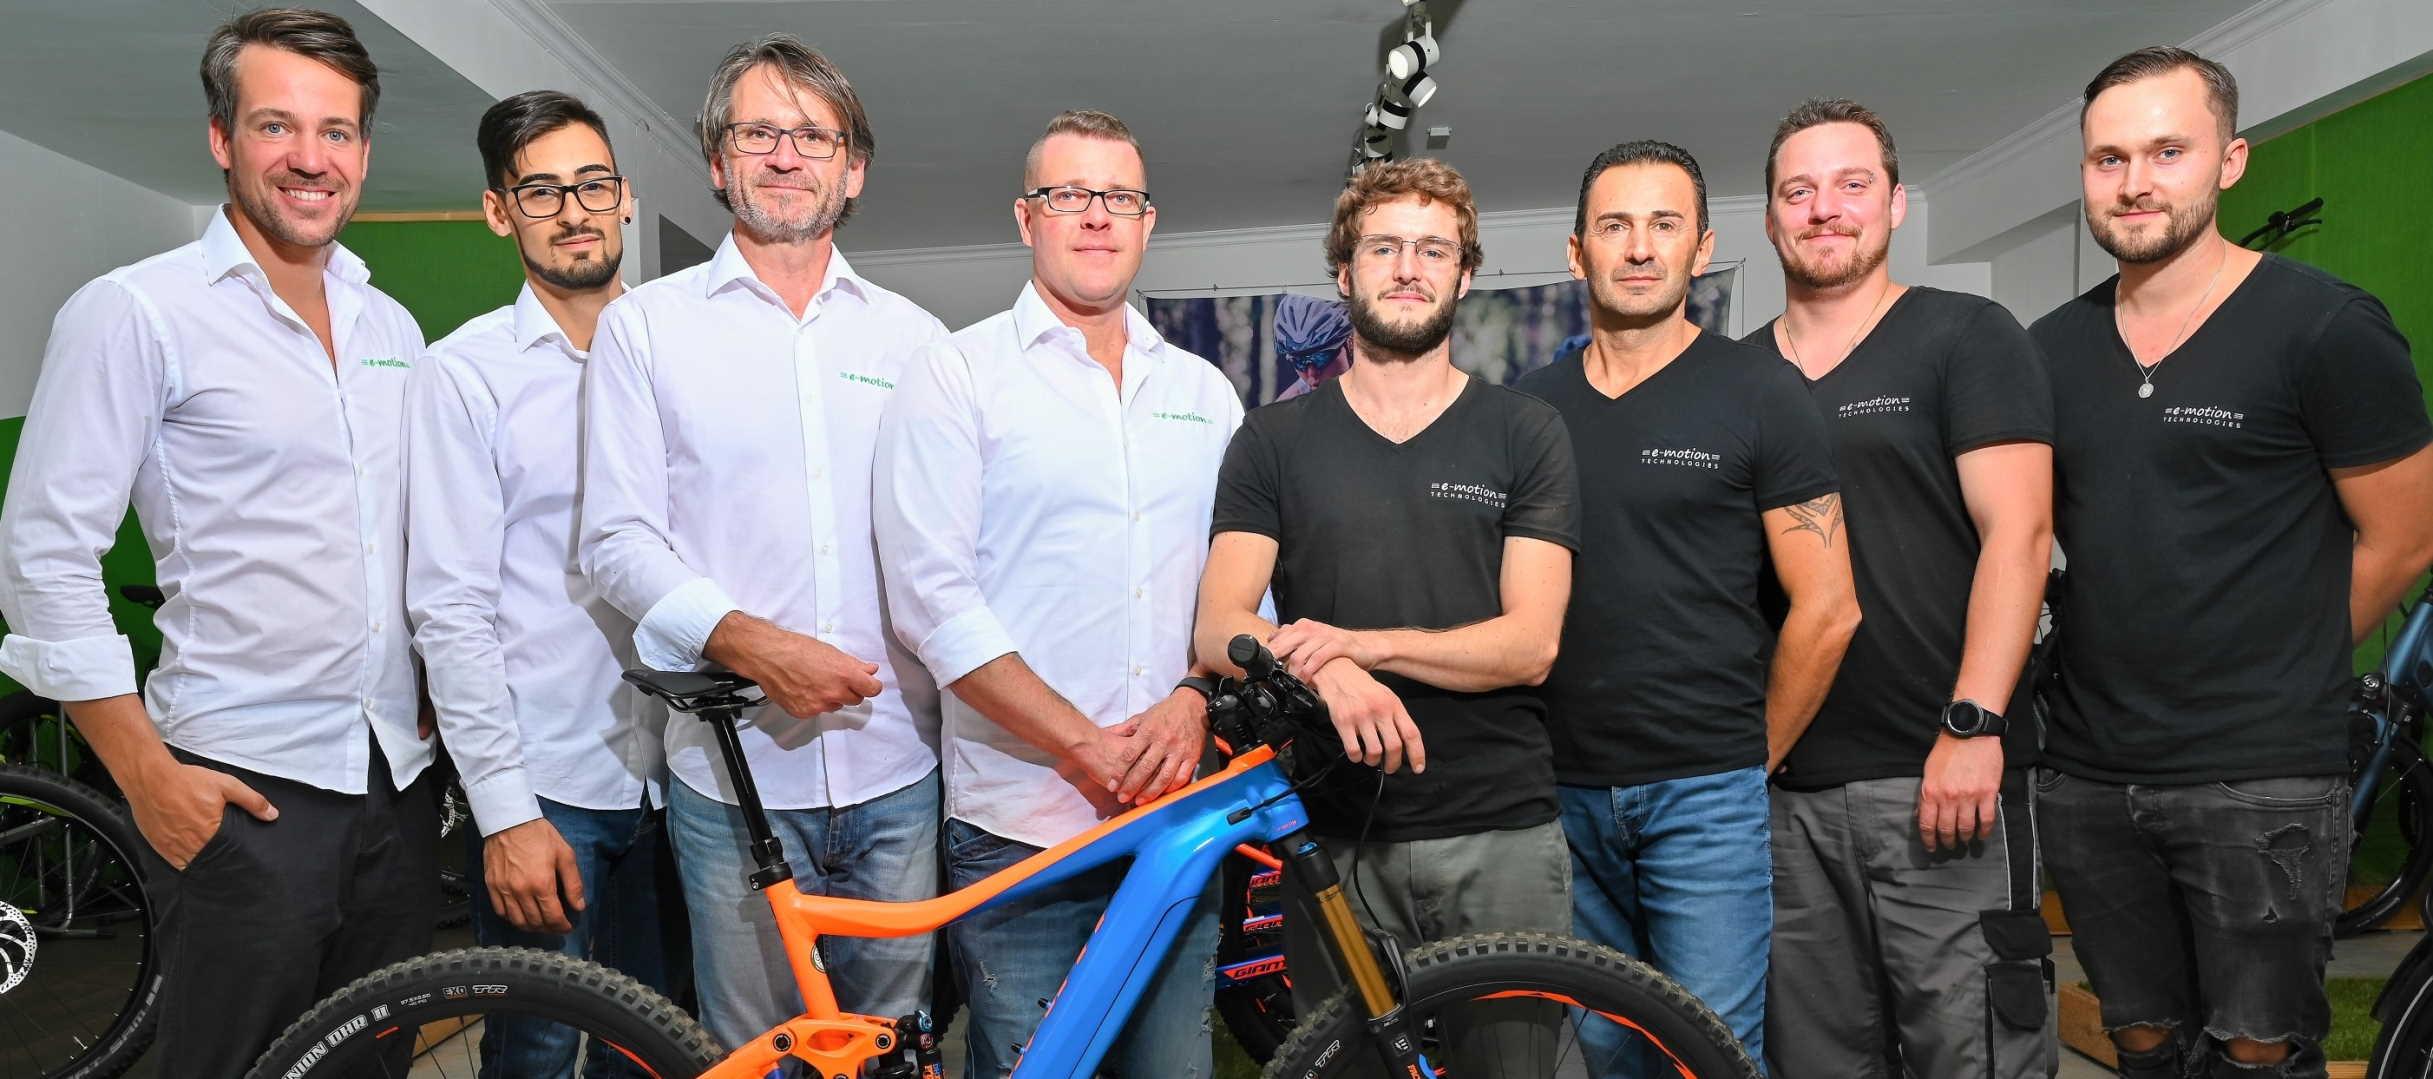 e-motion e-Bike Welt Frankfurt